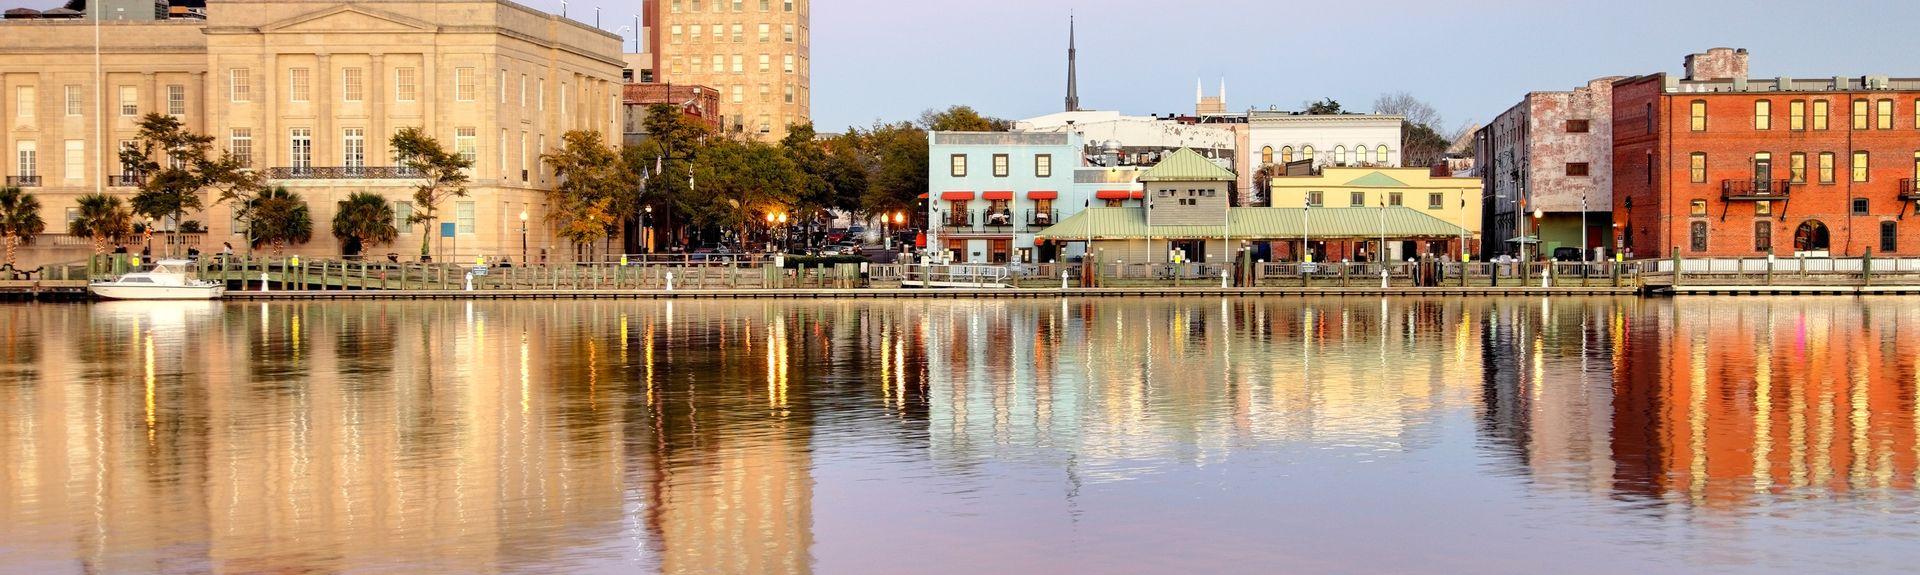 Wilmington, North Carolina, United States of America